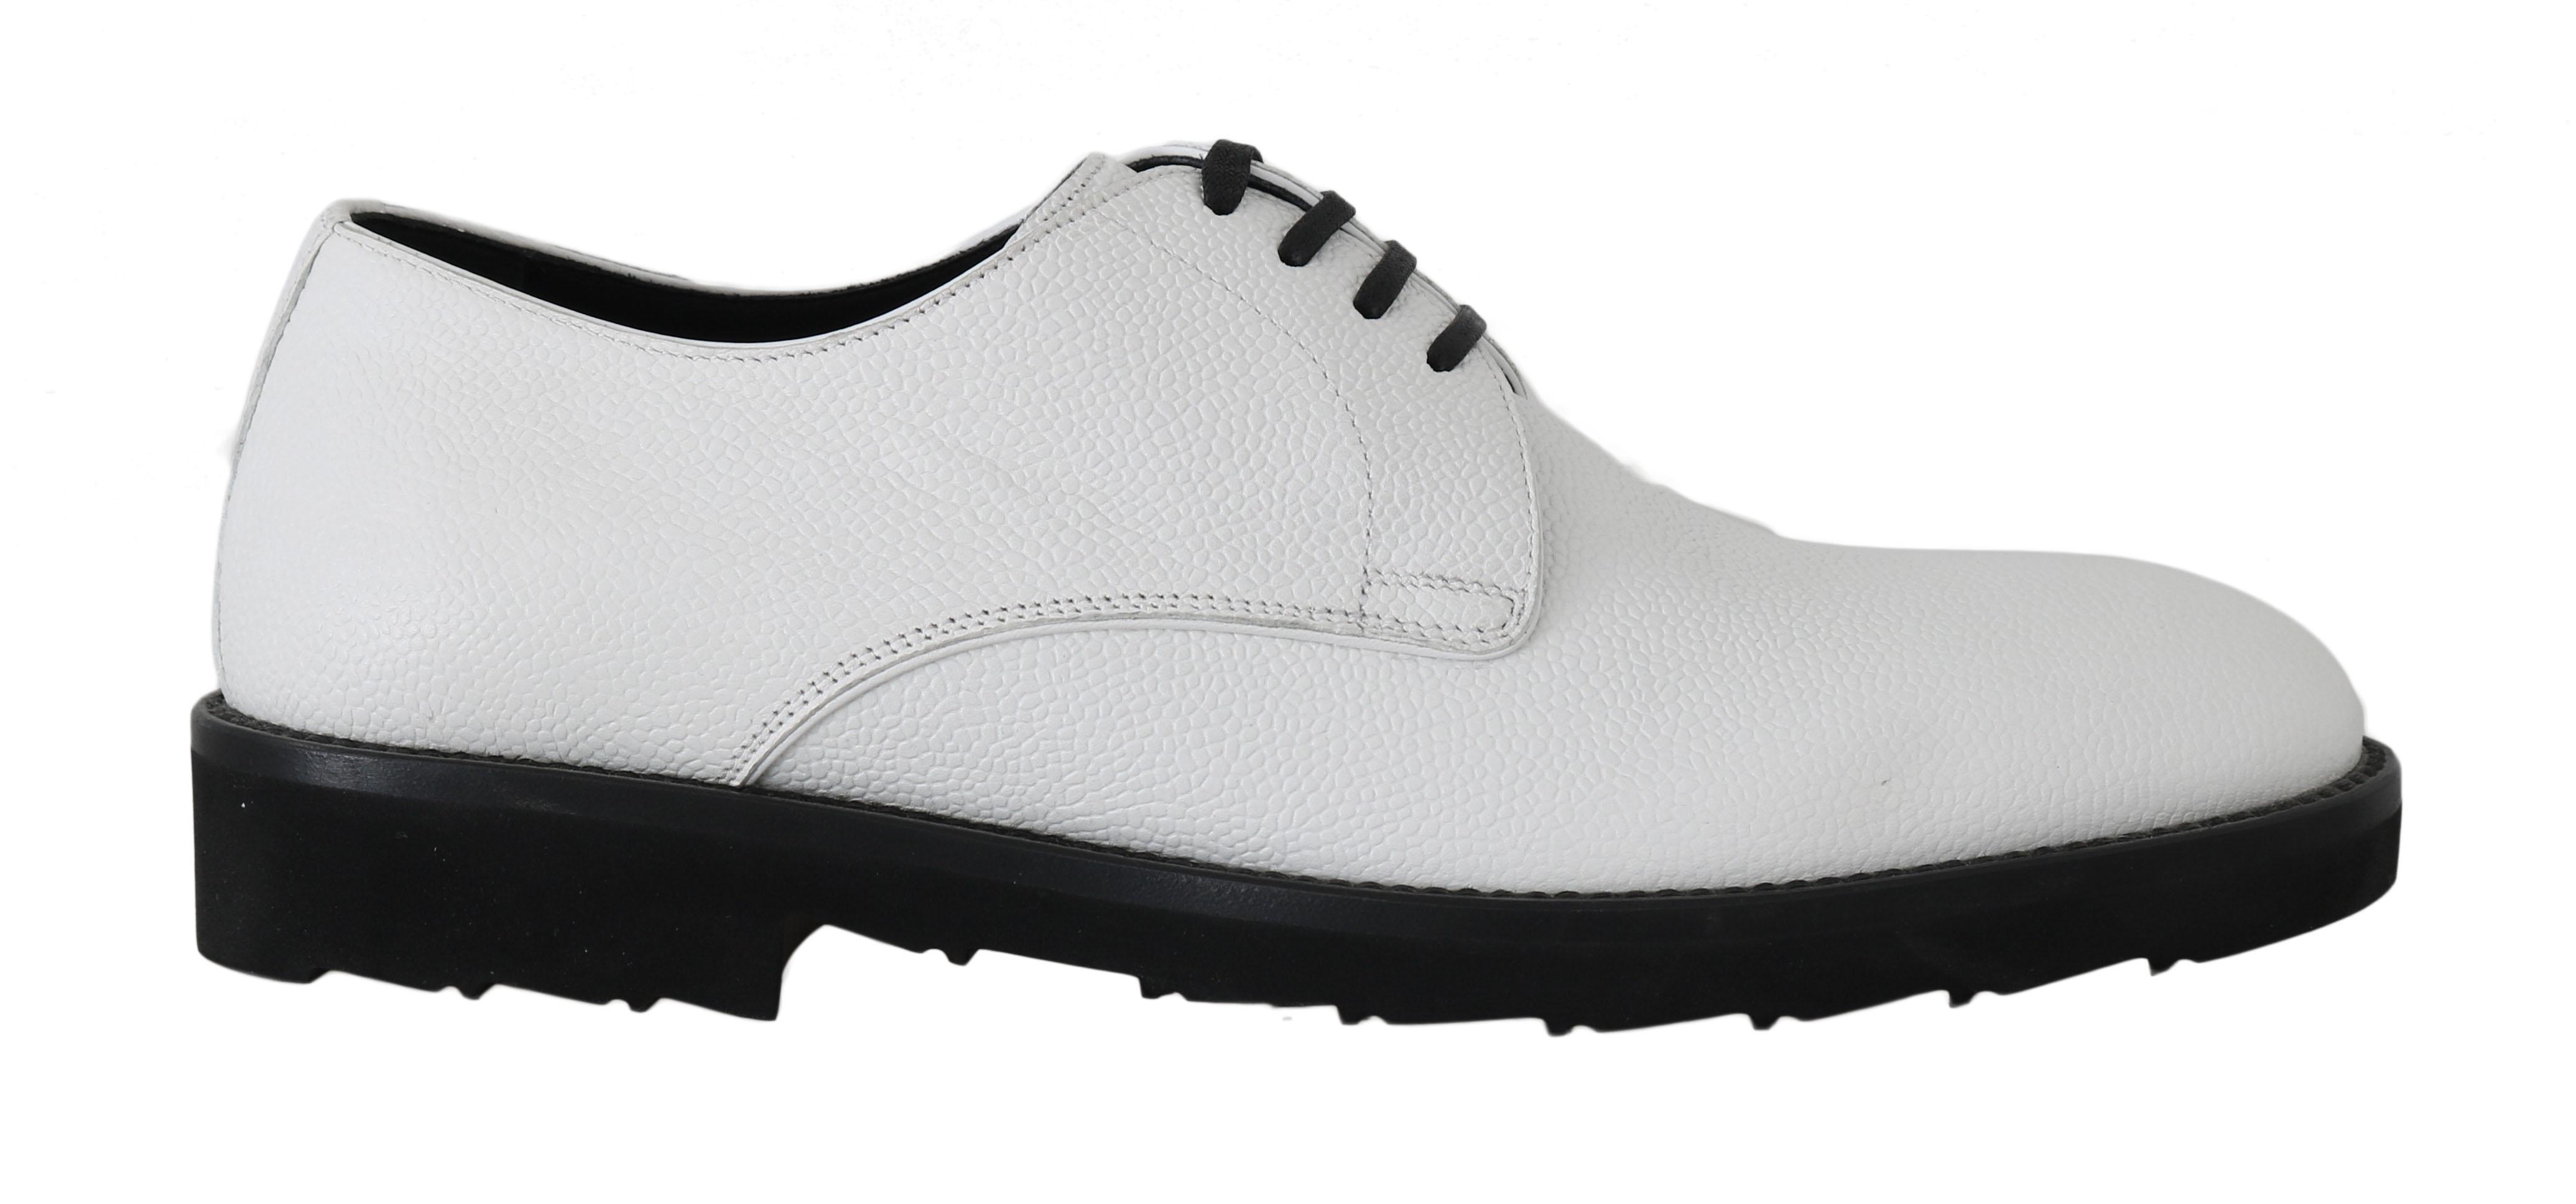 Dolce & Gabbana Men's Leather Formal Derby Shoes White MV2173 - EU45/US12